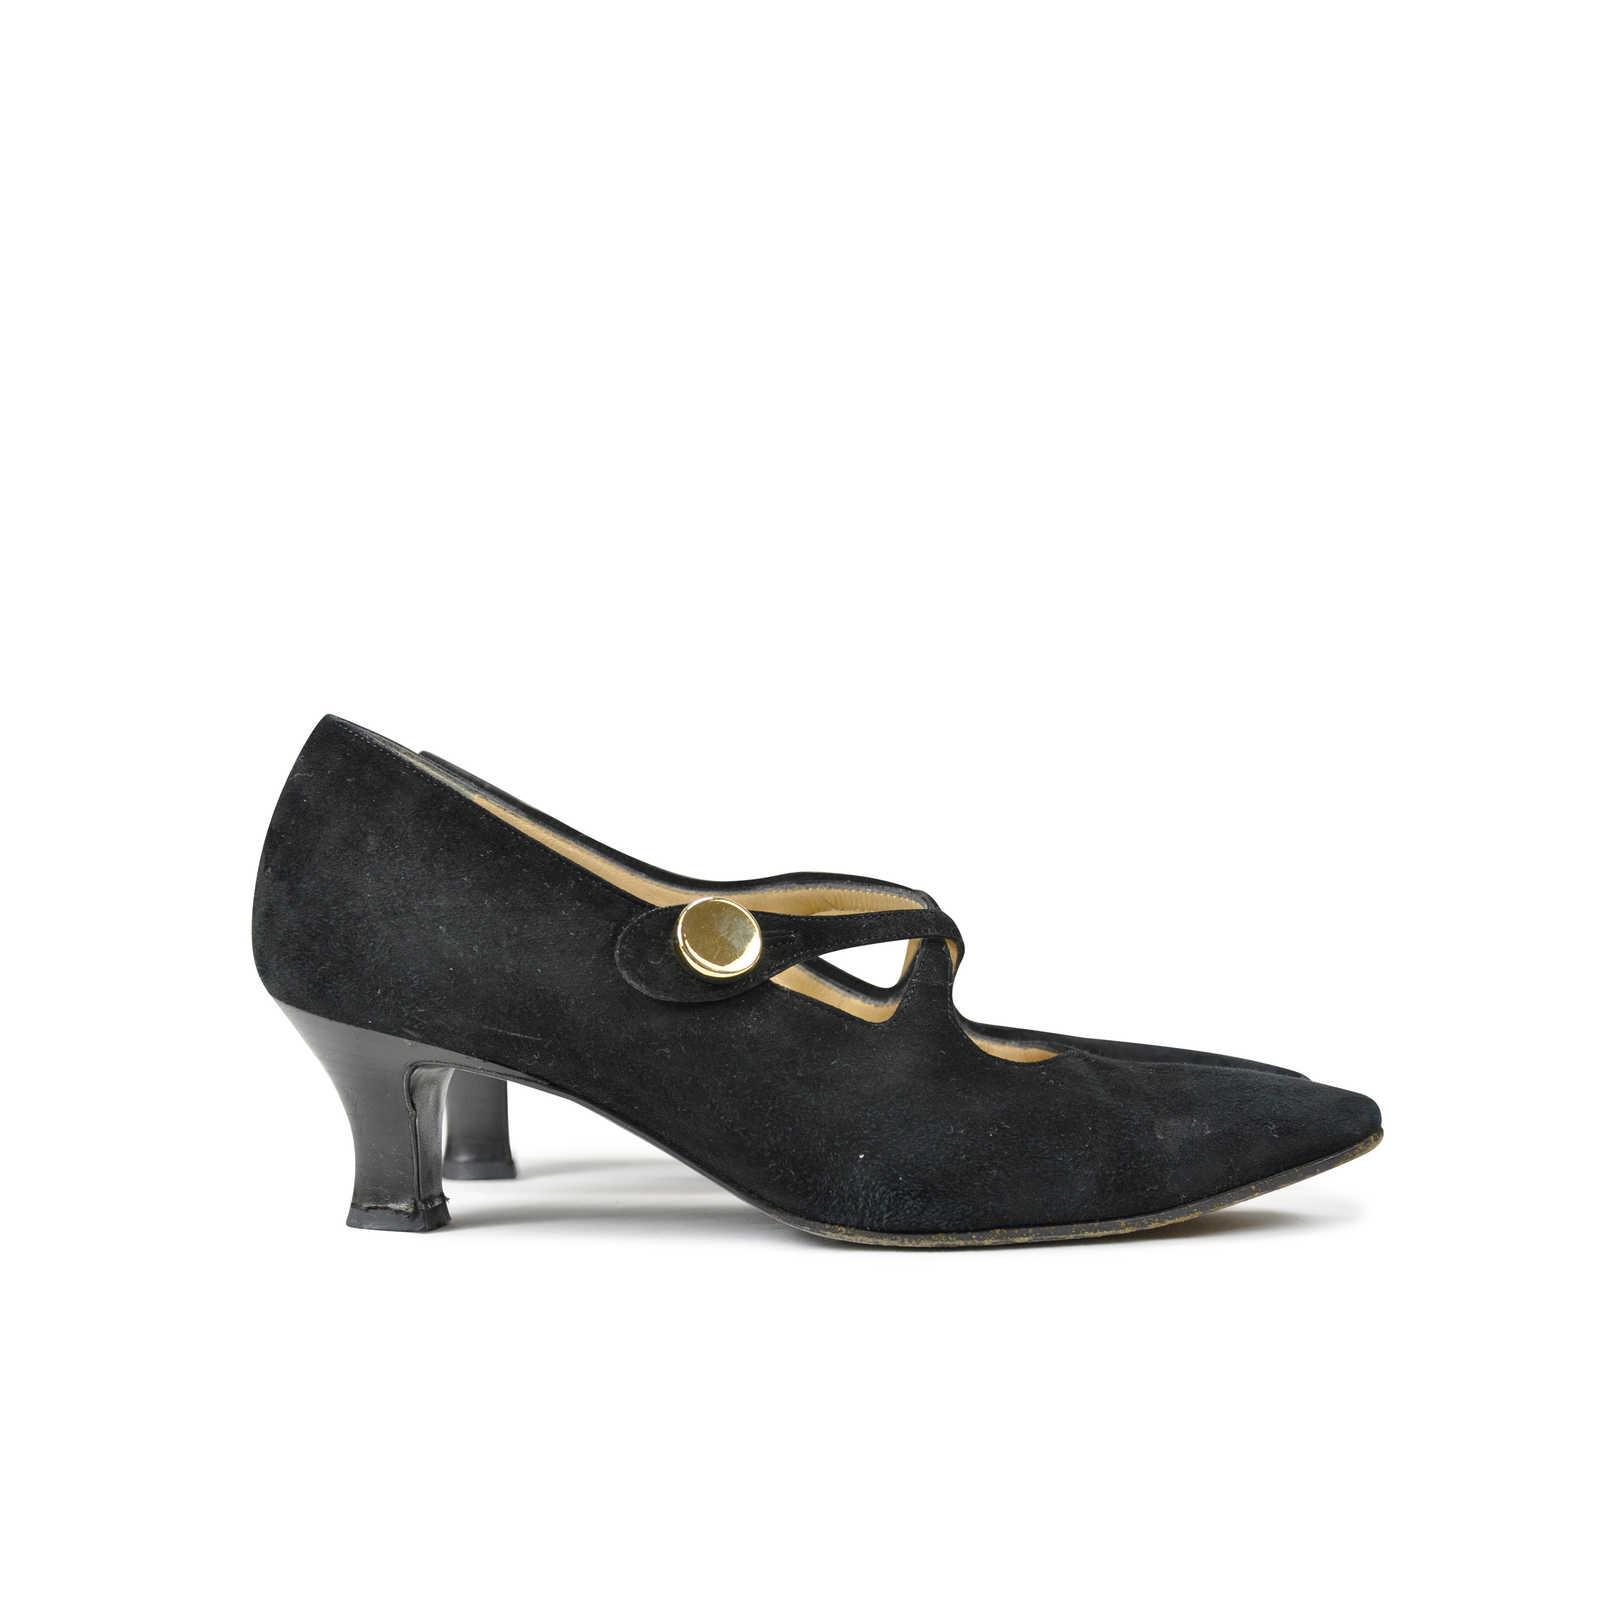 quality design 64025 e3565 prada-black-suede-kitten-heels-2.jpg